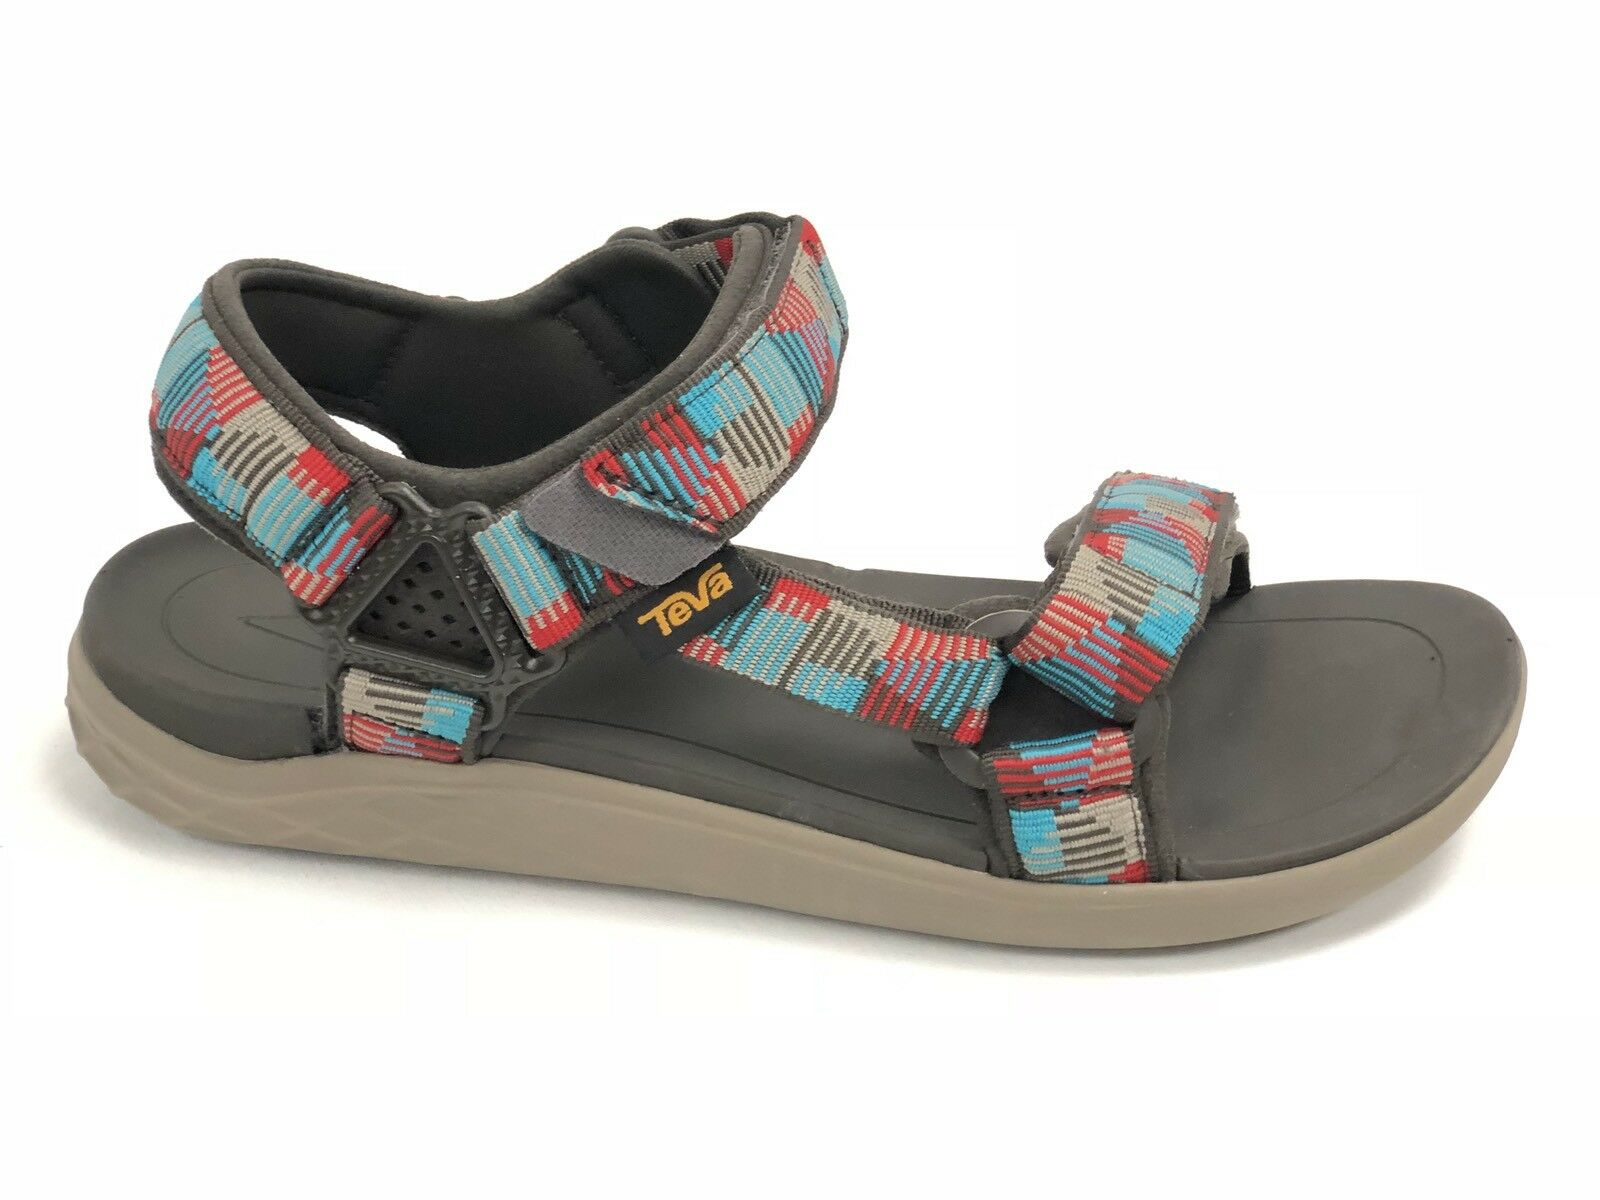 Ugg Australia Women's Shoe Size 6.5 M  Metallic Patent Leather Flat Sandal NIB